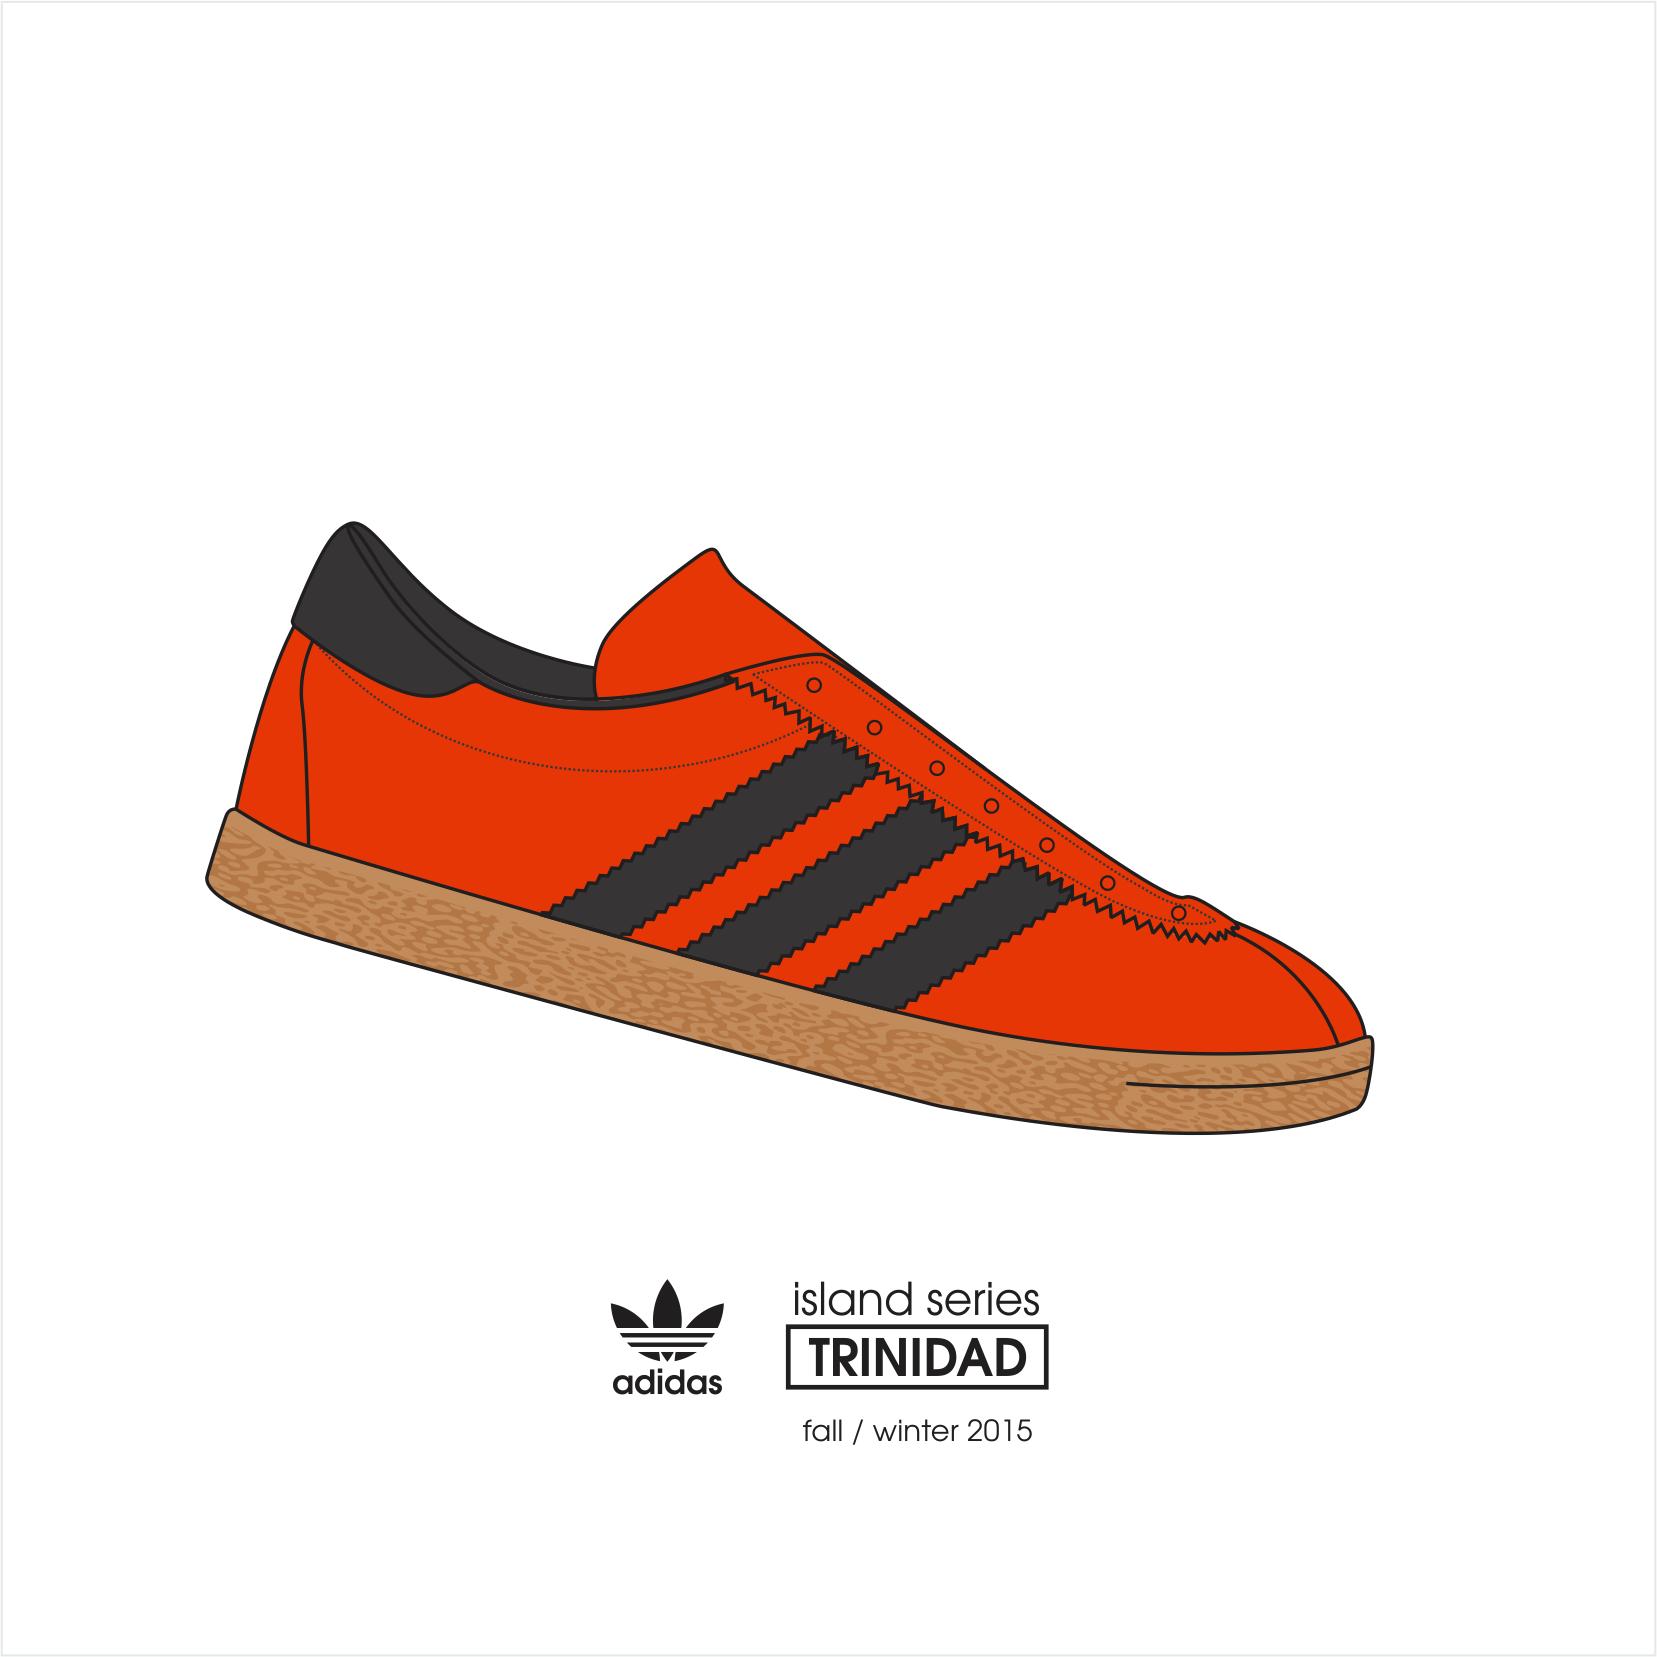 Adidas Trinidad Island Series Fall Winter 2015 Kicks